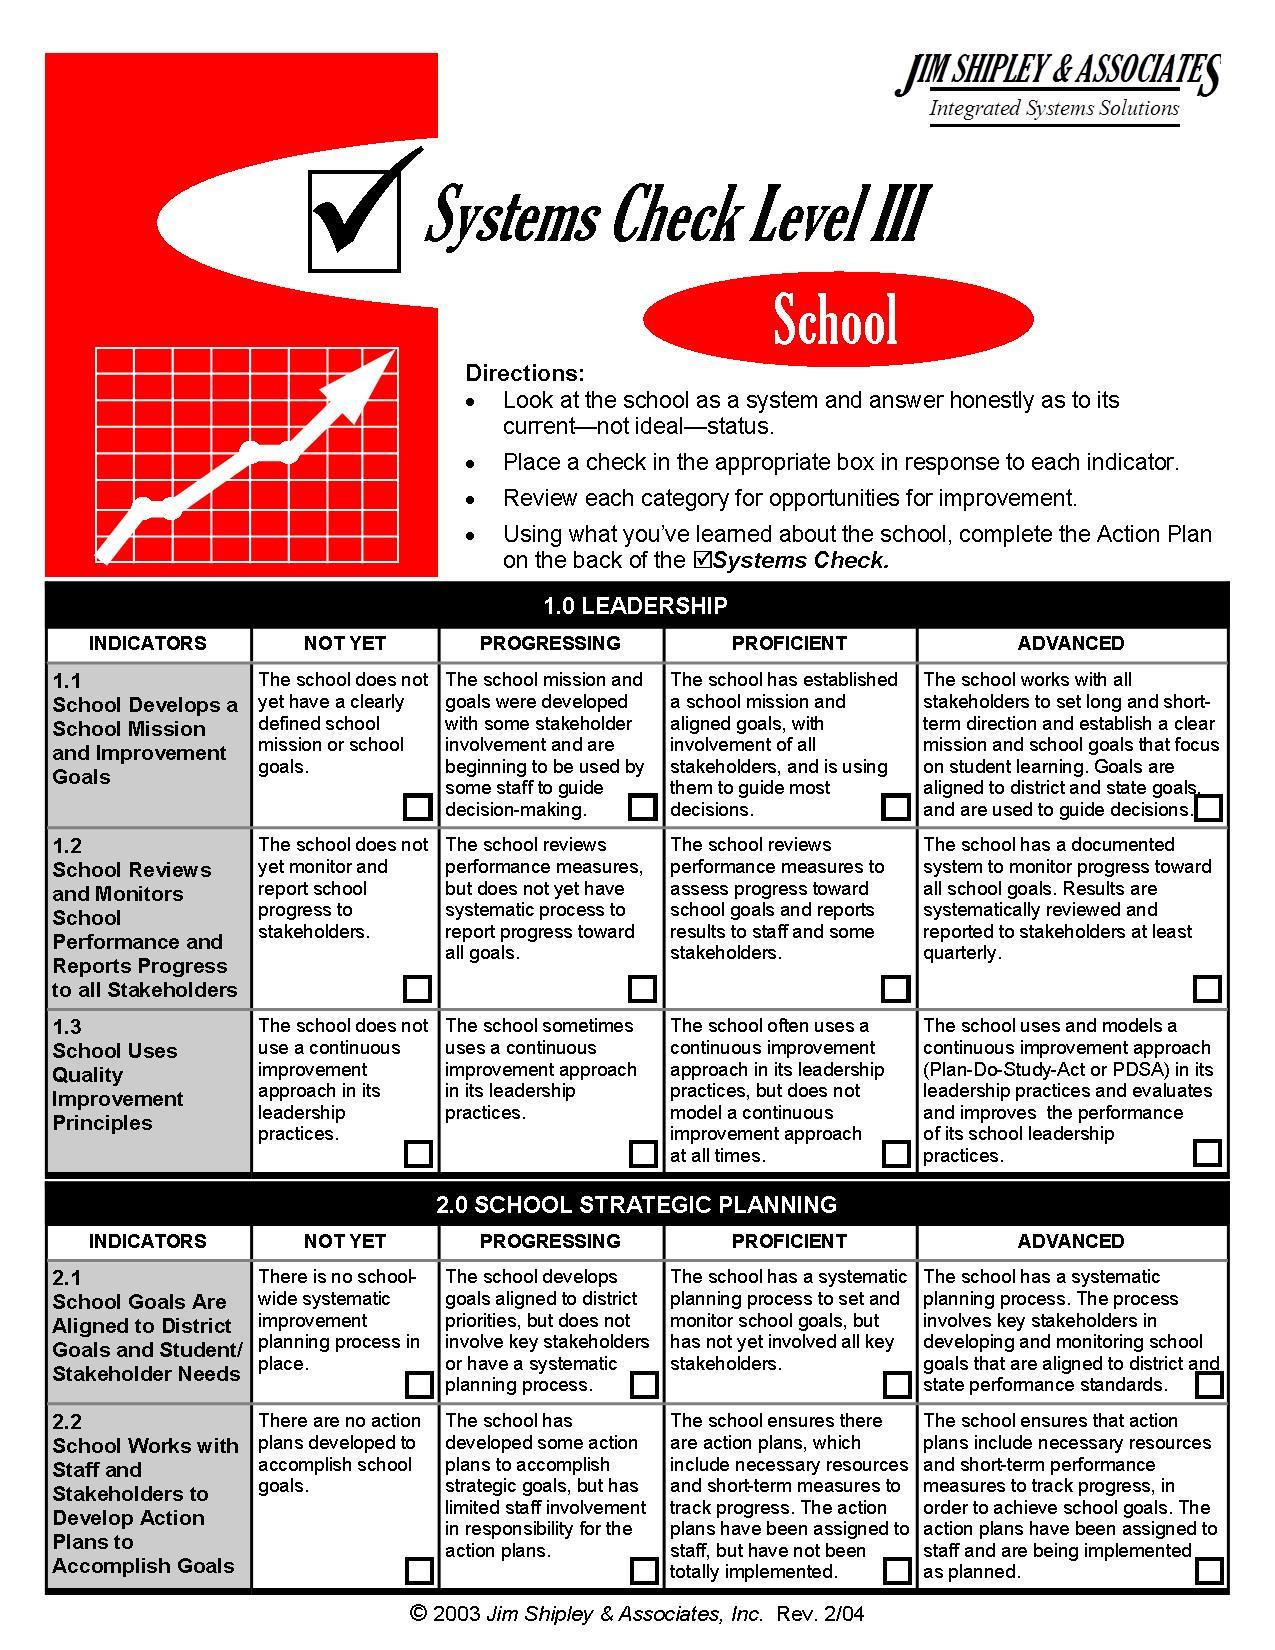 SC3School - School Systems Check III Cover Image